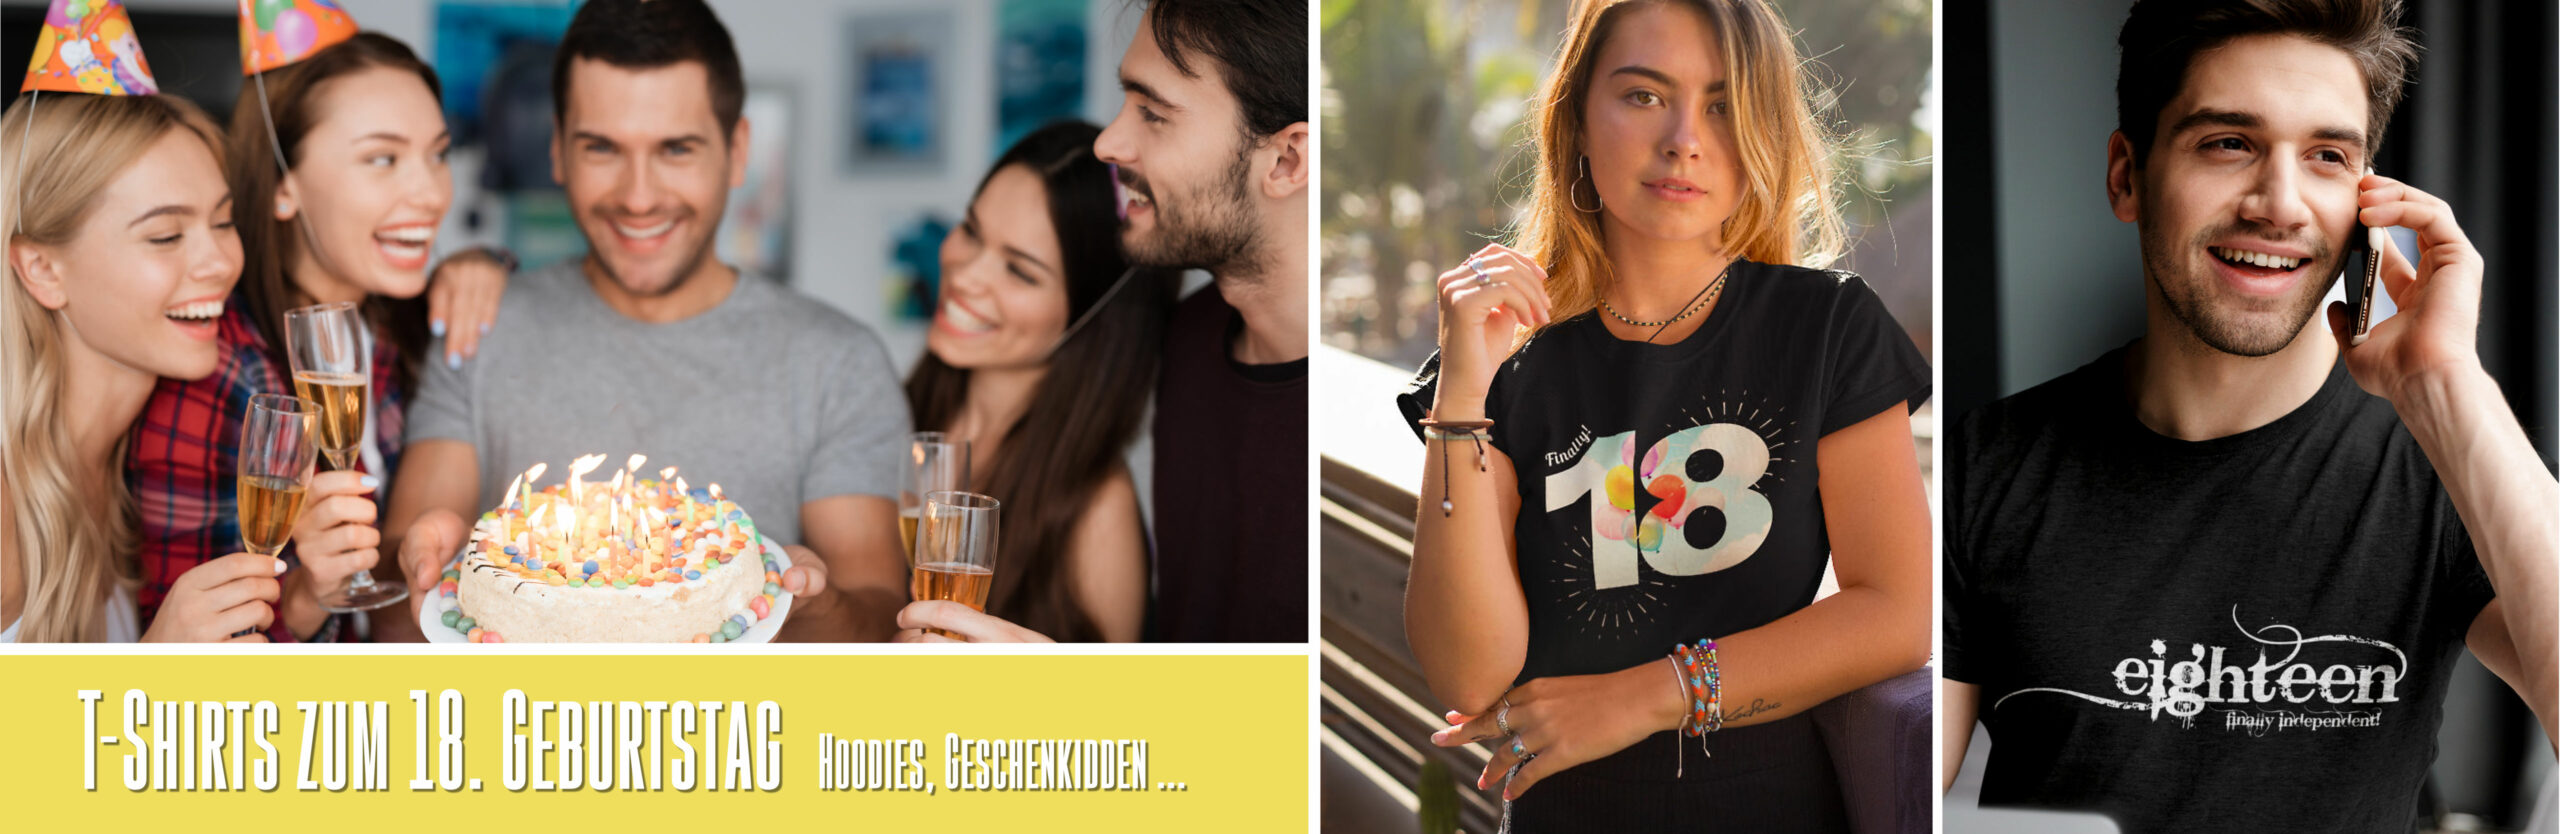 T-Shirts-18-Geburtstag